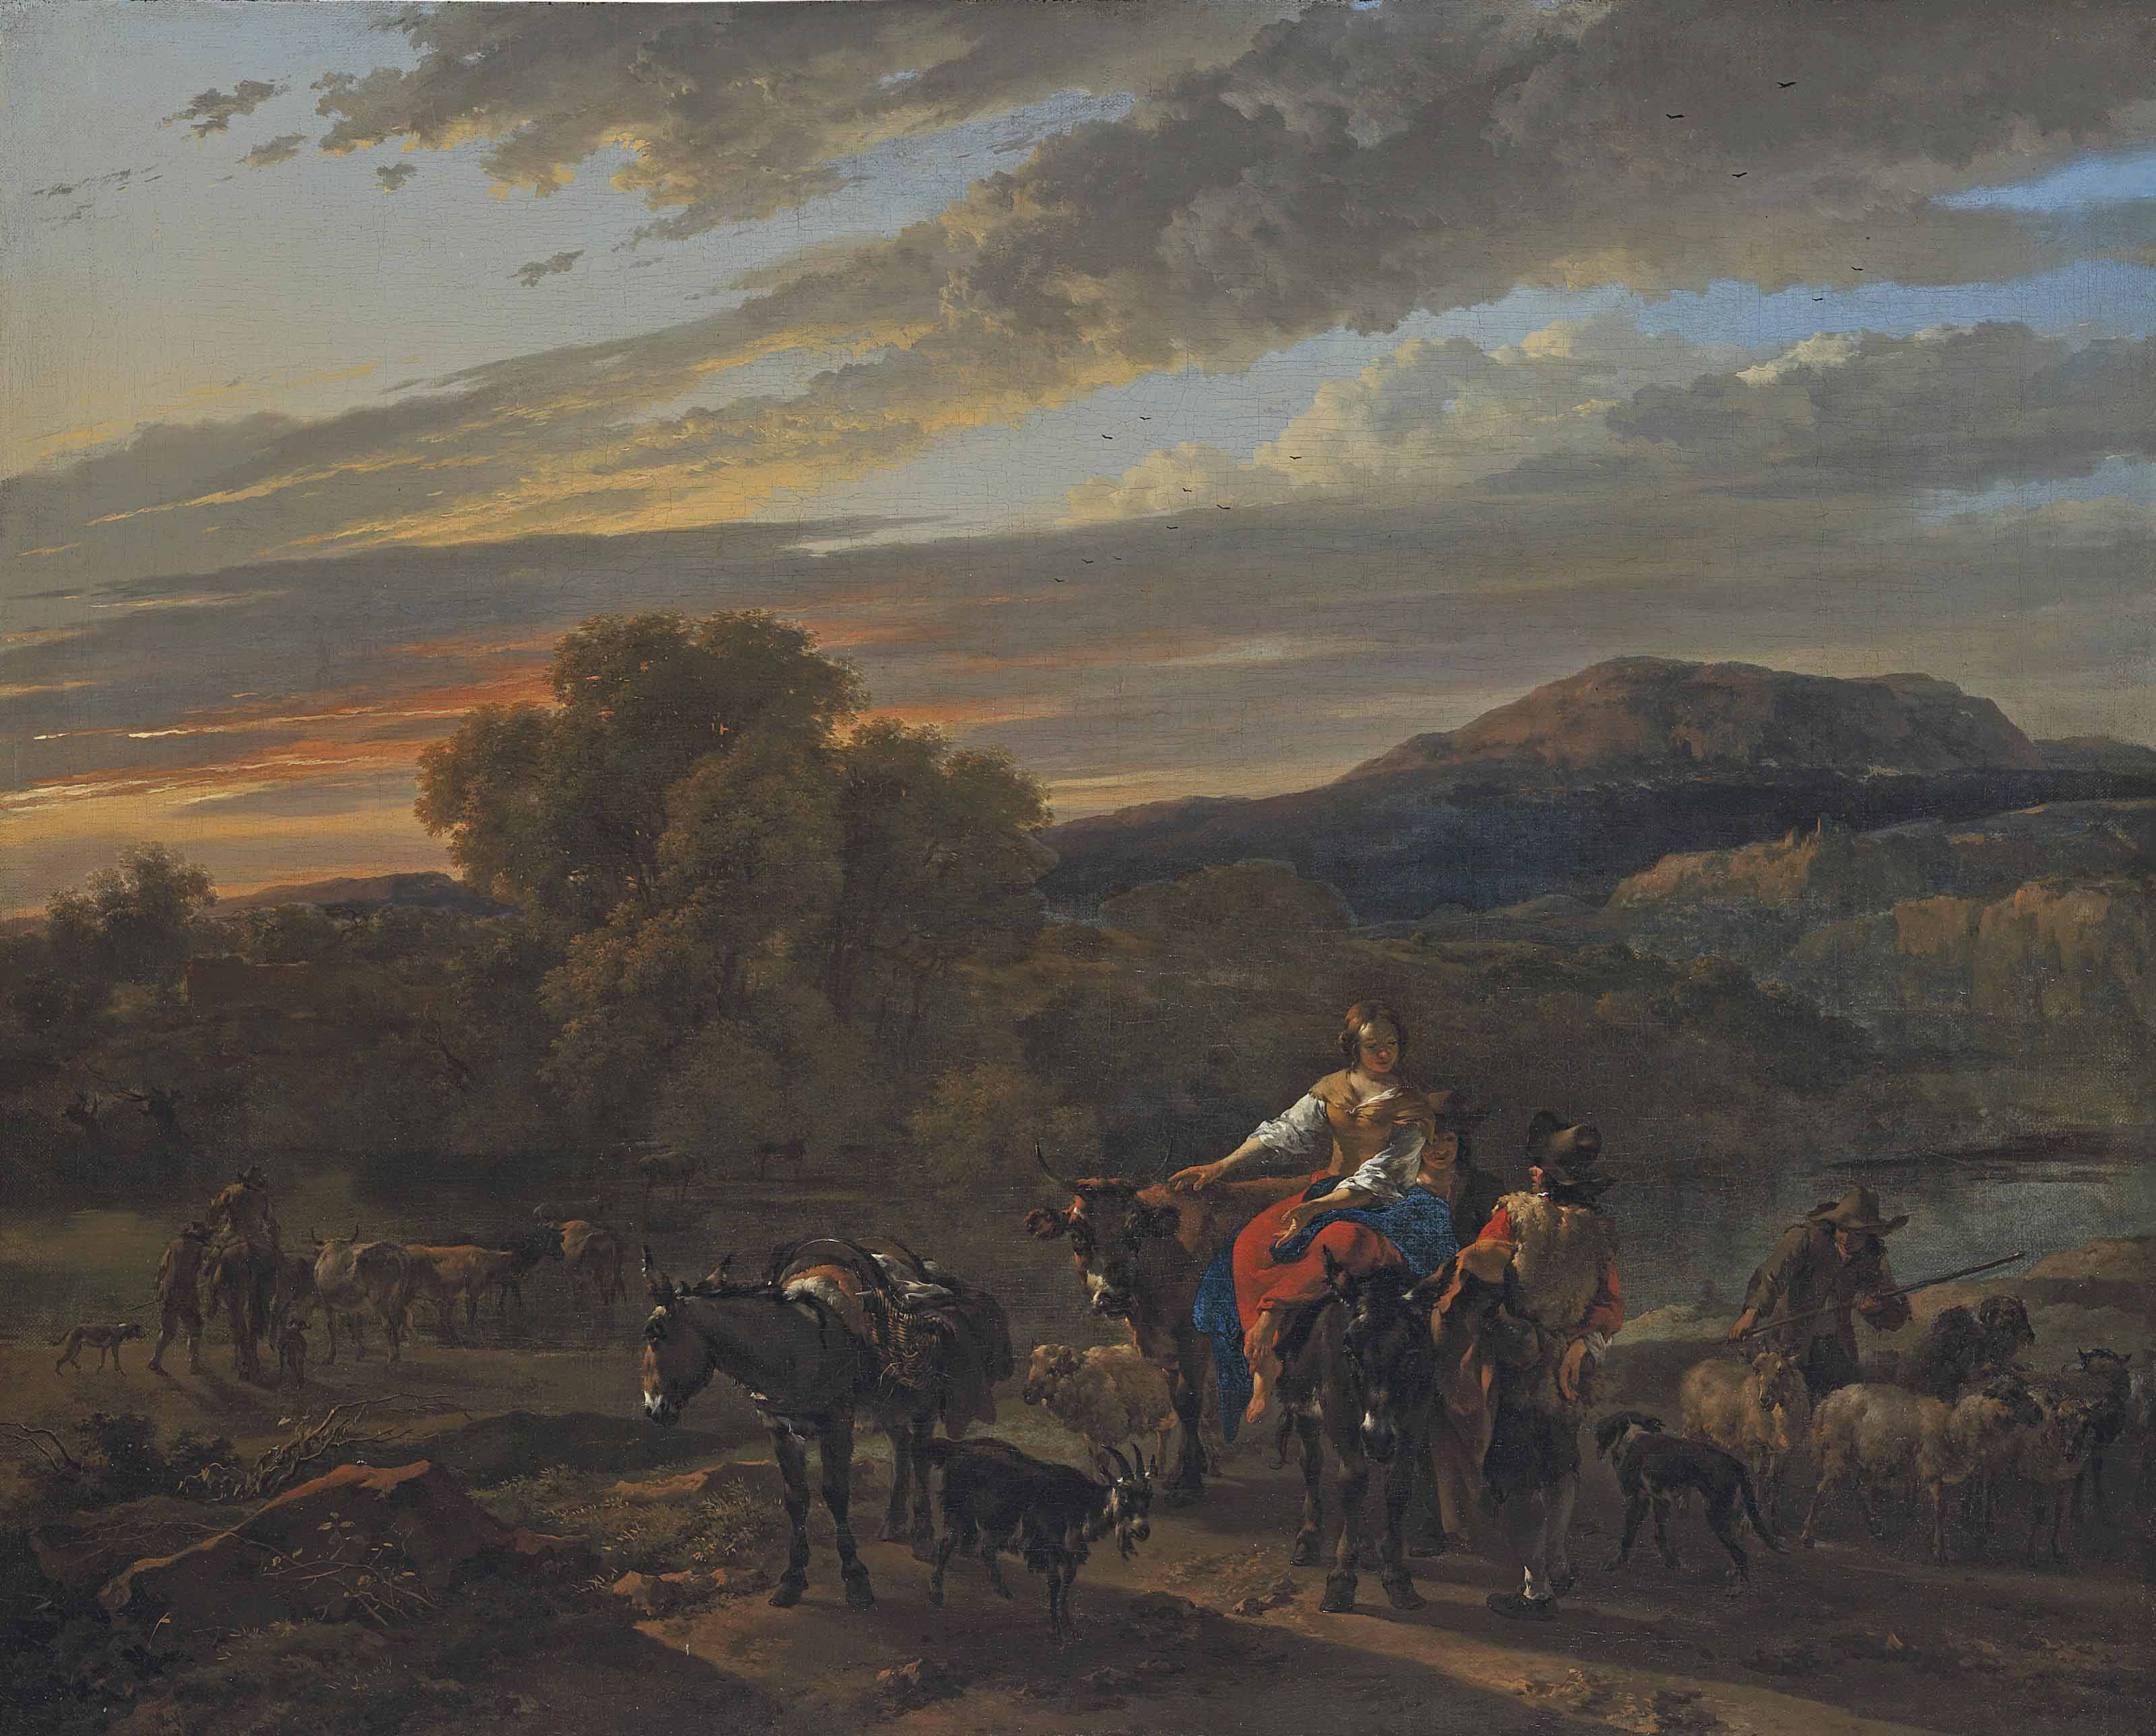 Nicolaes Berchem (Haarlem 1620-1683 Amsterdam)